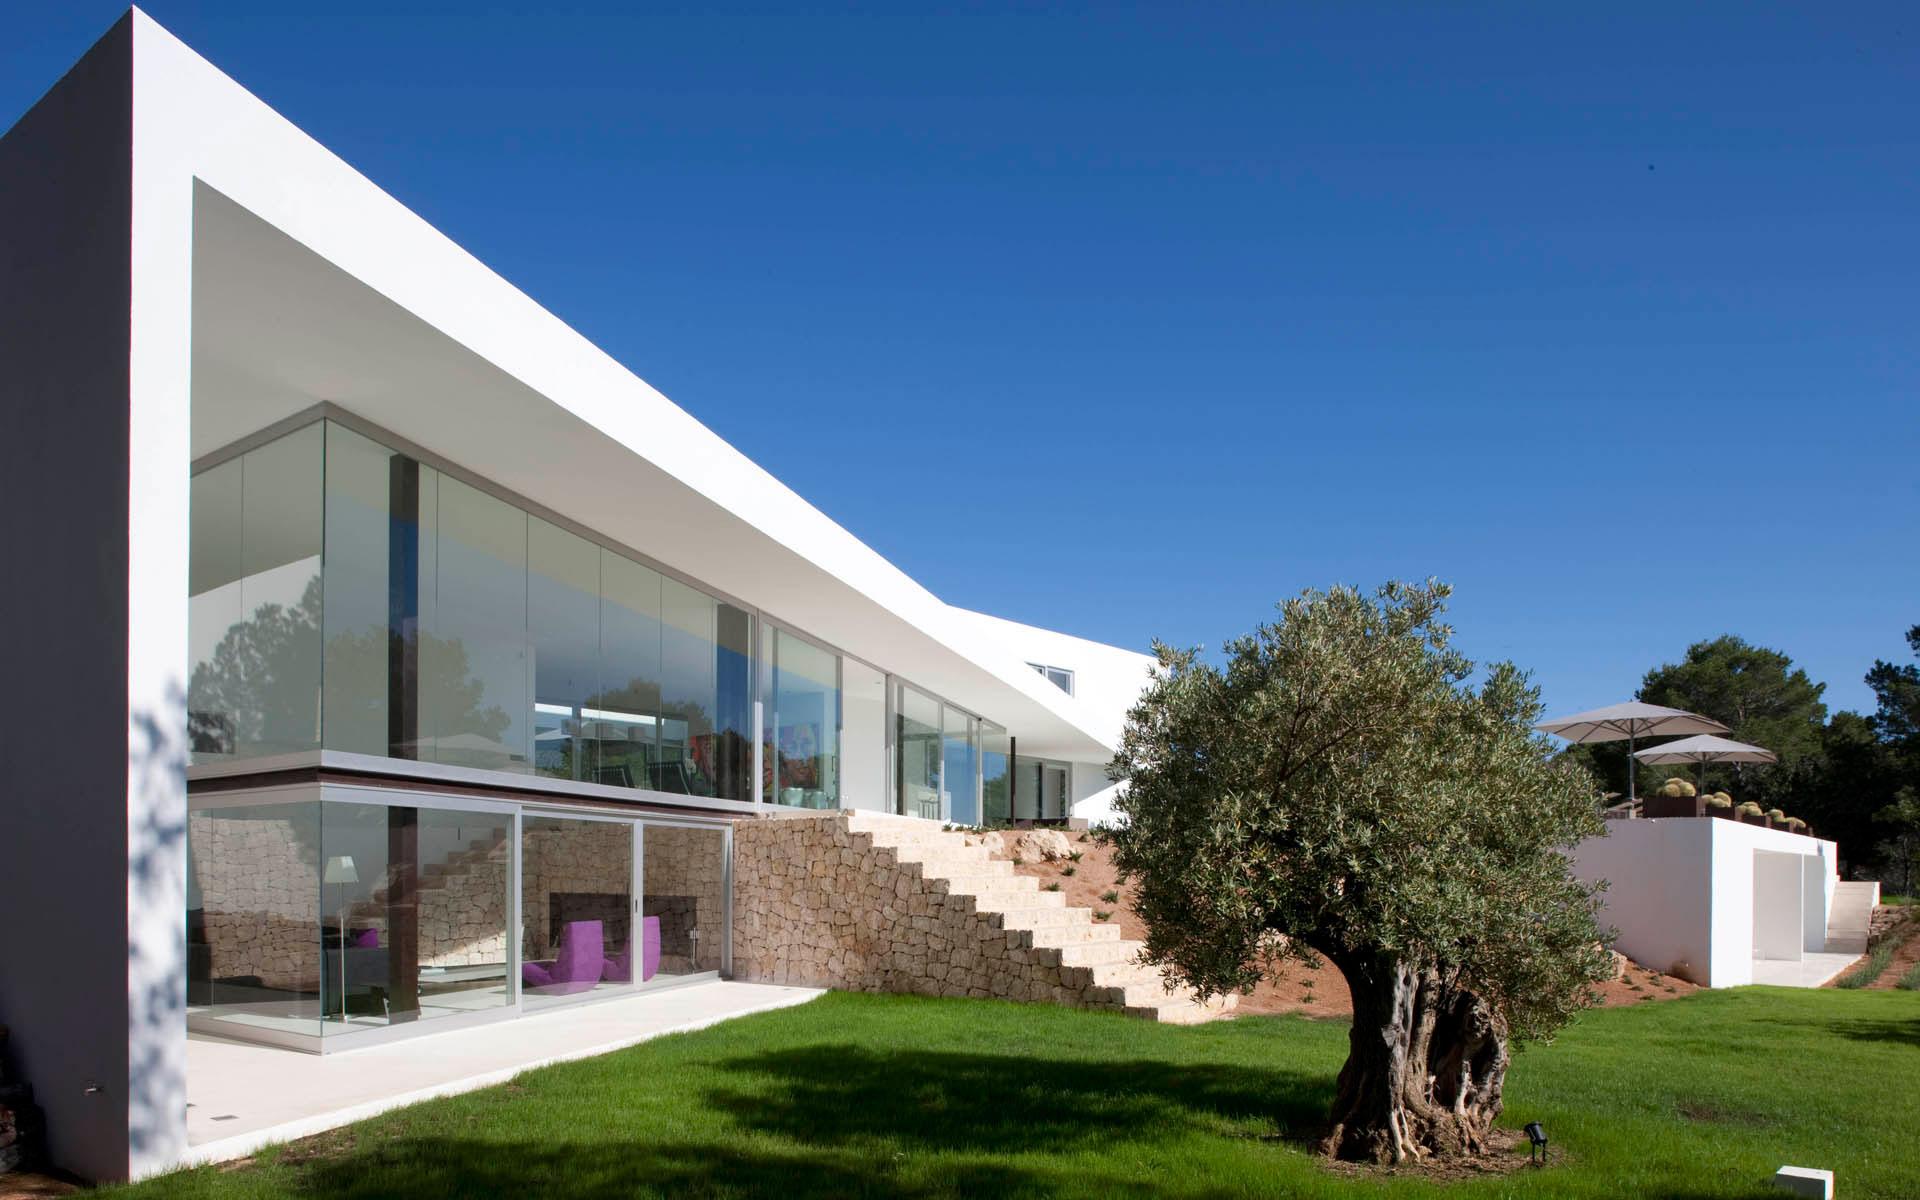 Mediterranean villa ixos in ibiza caandesign for Mediterranean villa architecture